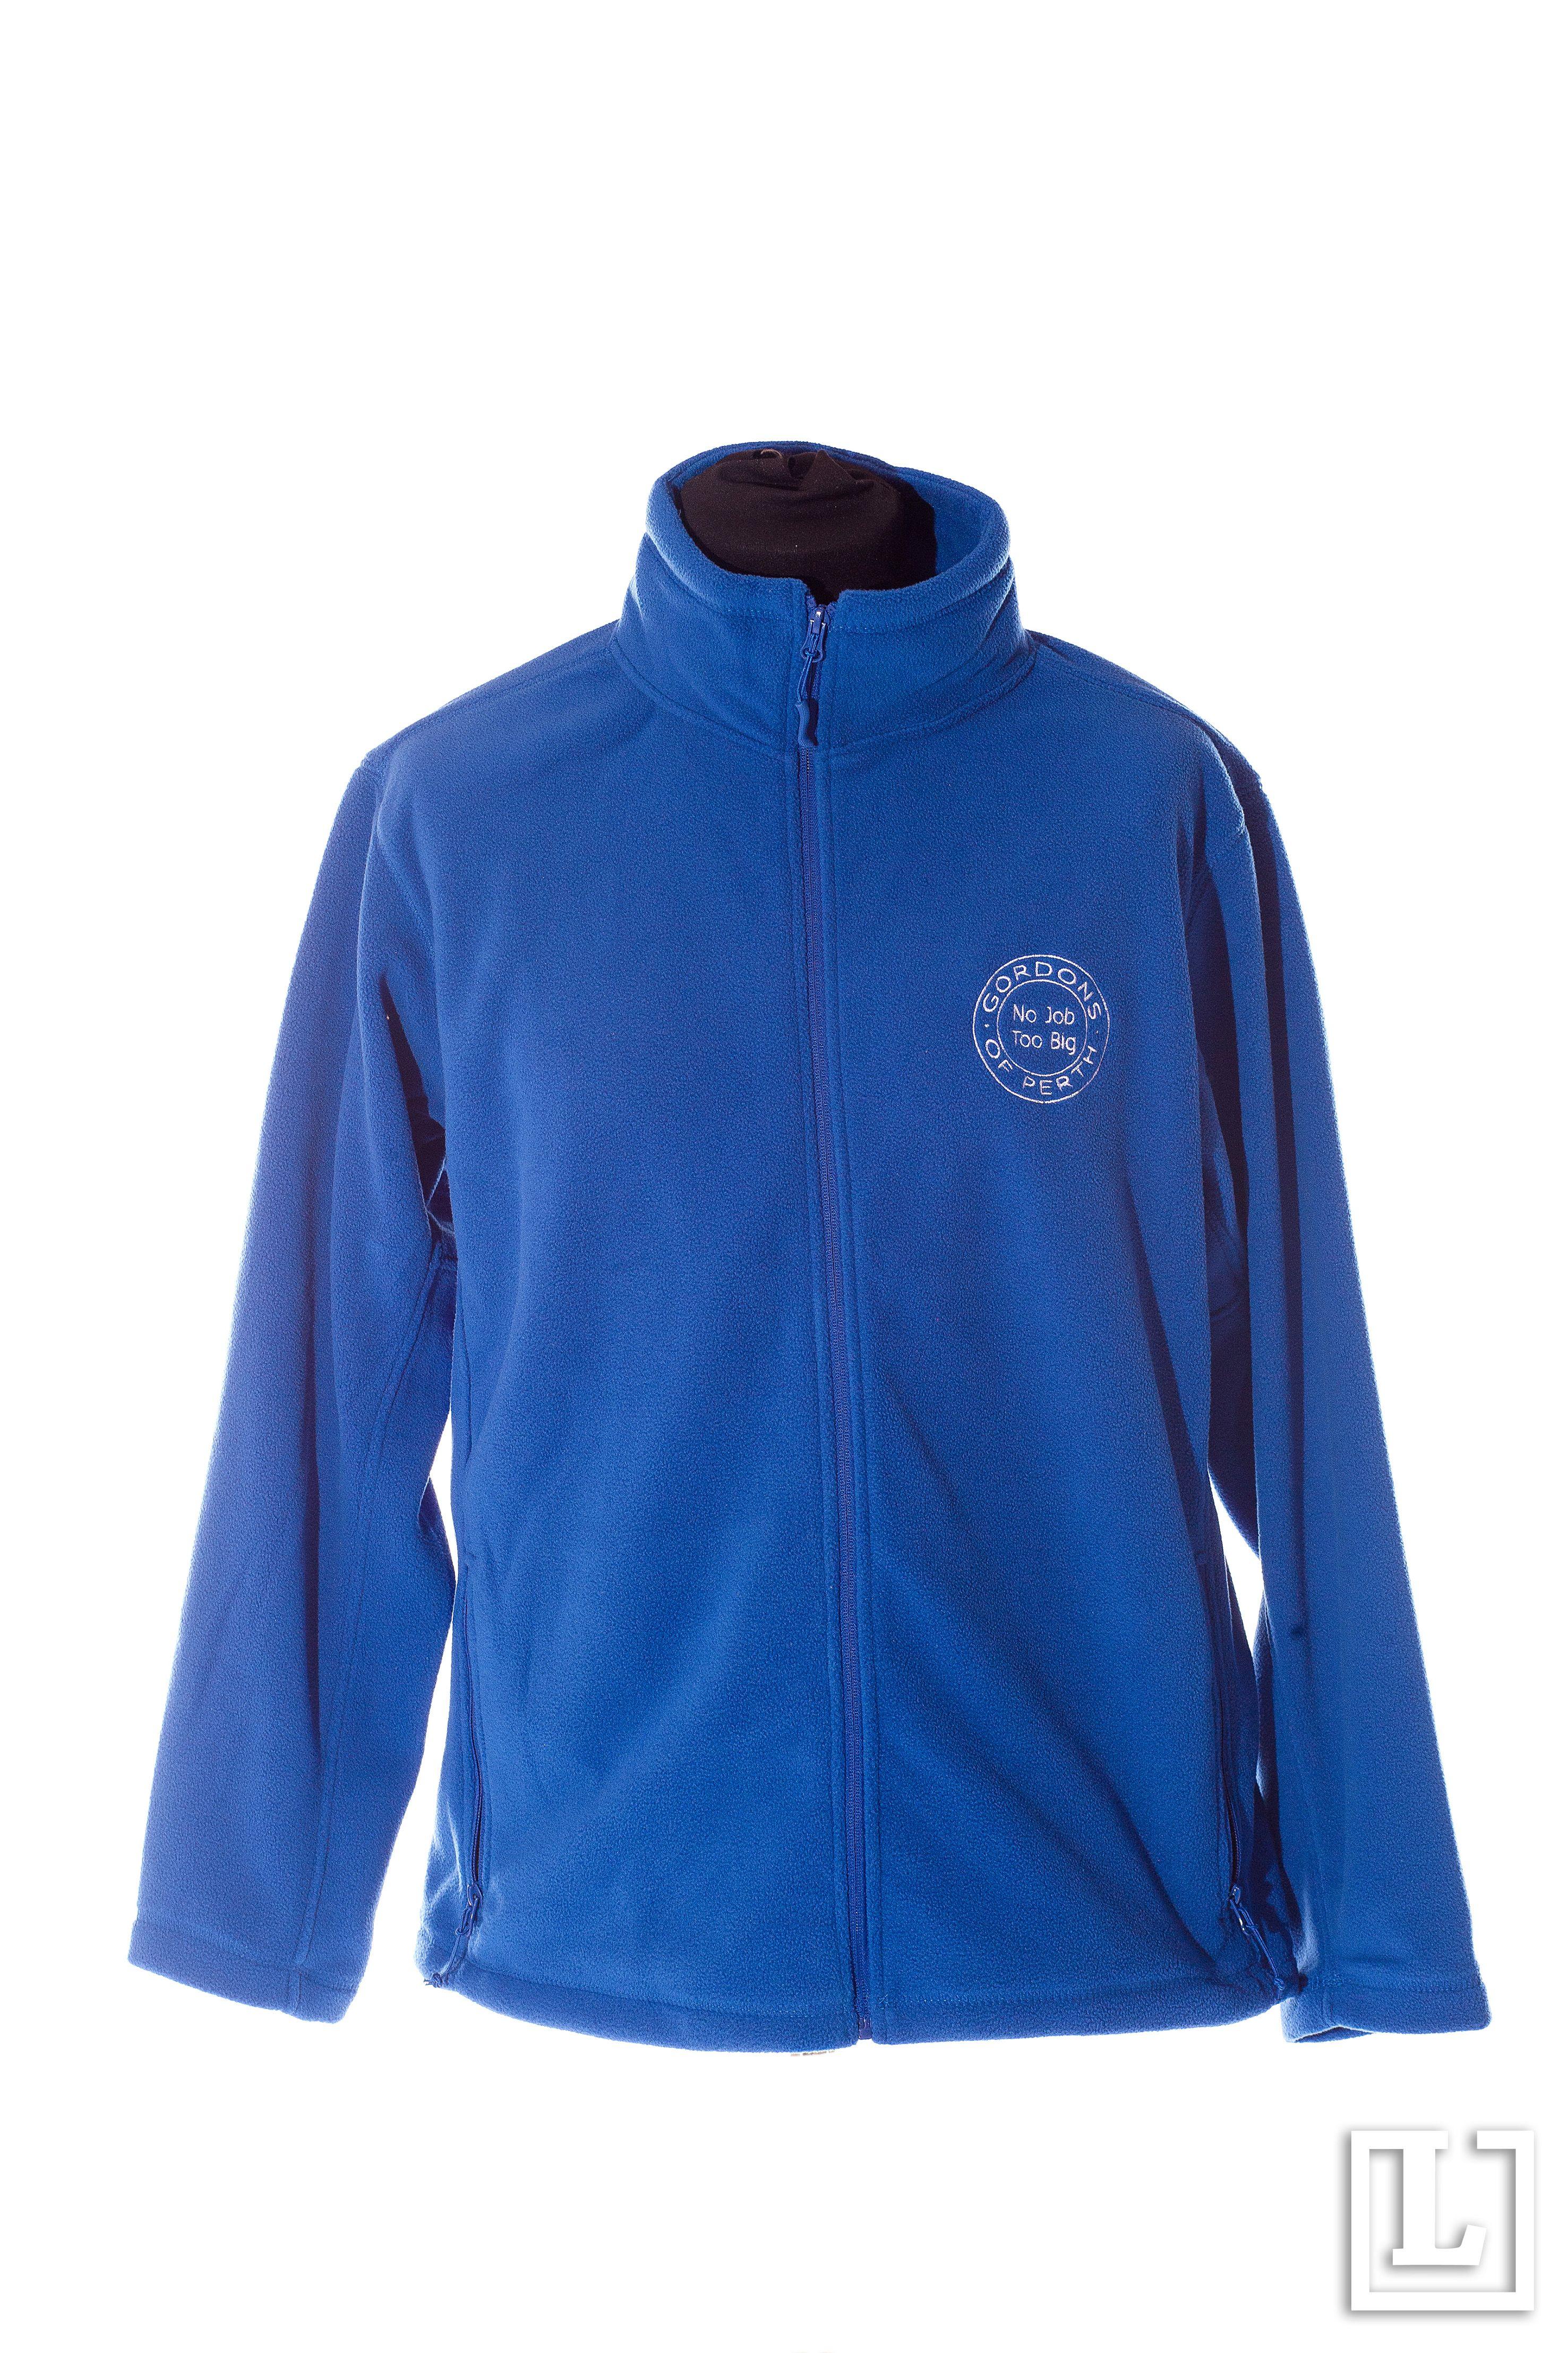 Custom Mens Summit Sweater Fleece Jacket